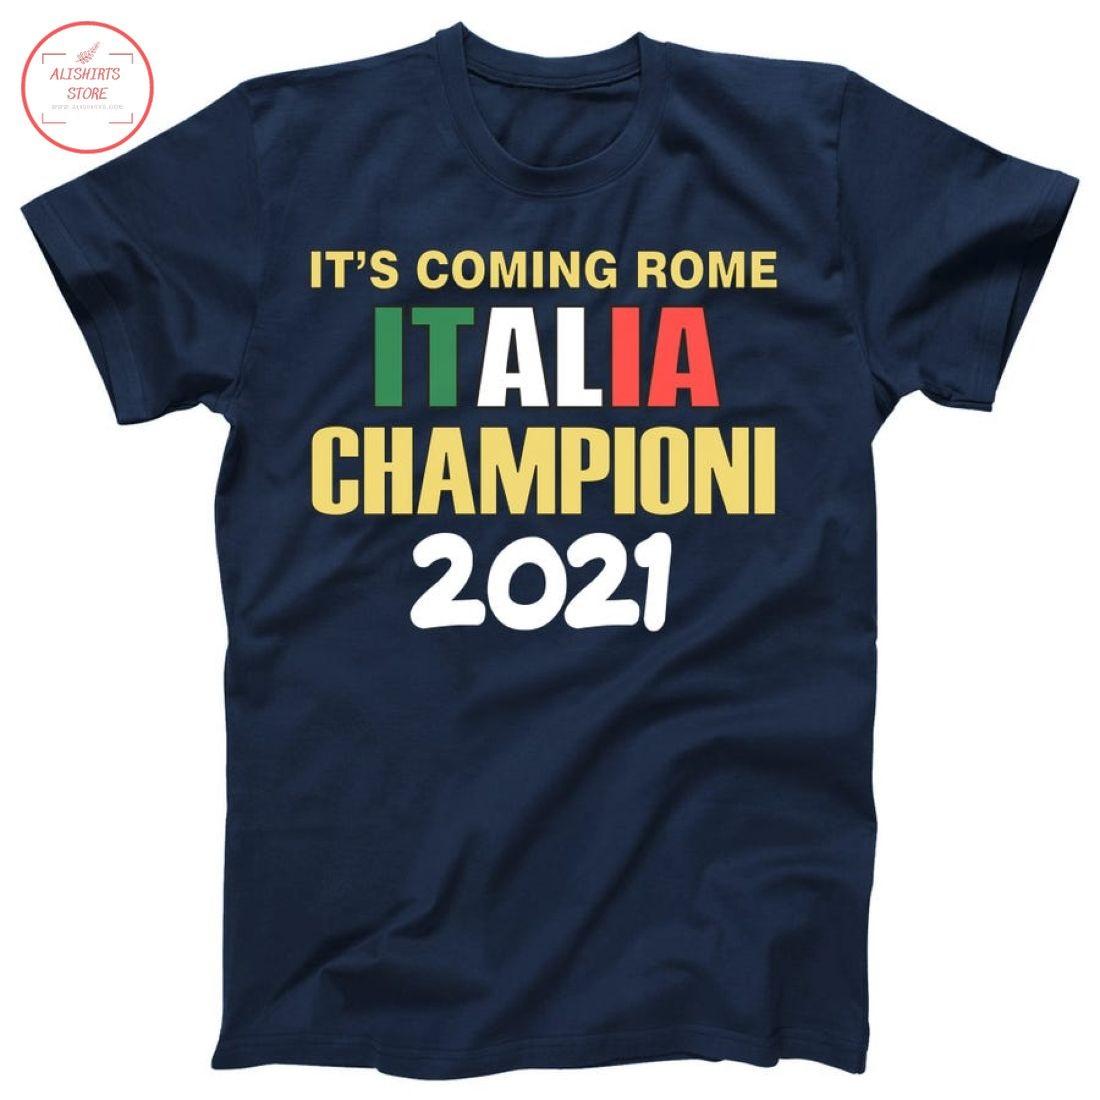 It's Coming Rome Italia Championi 2021 Shirt